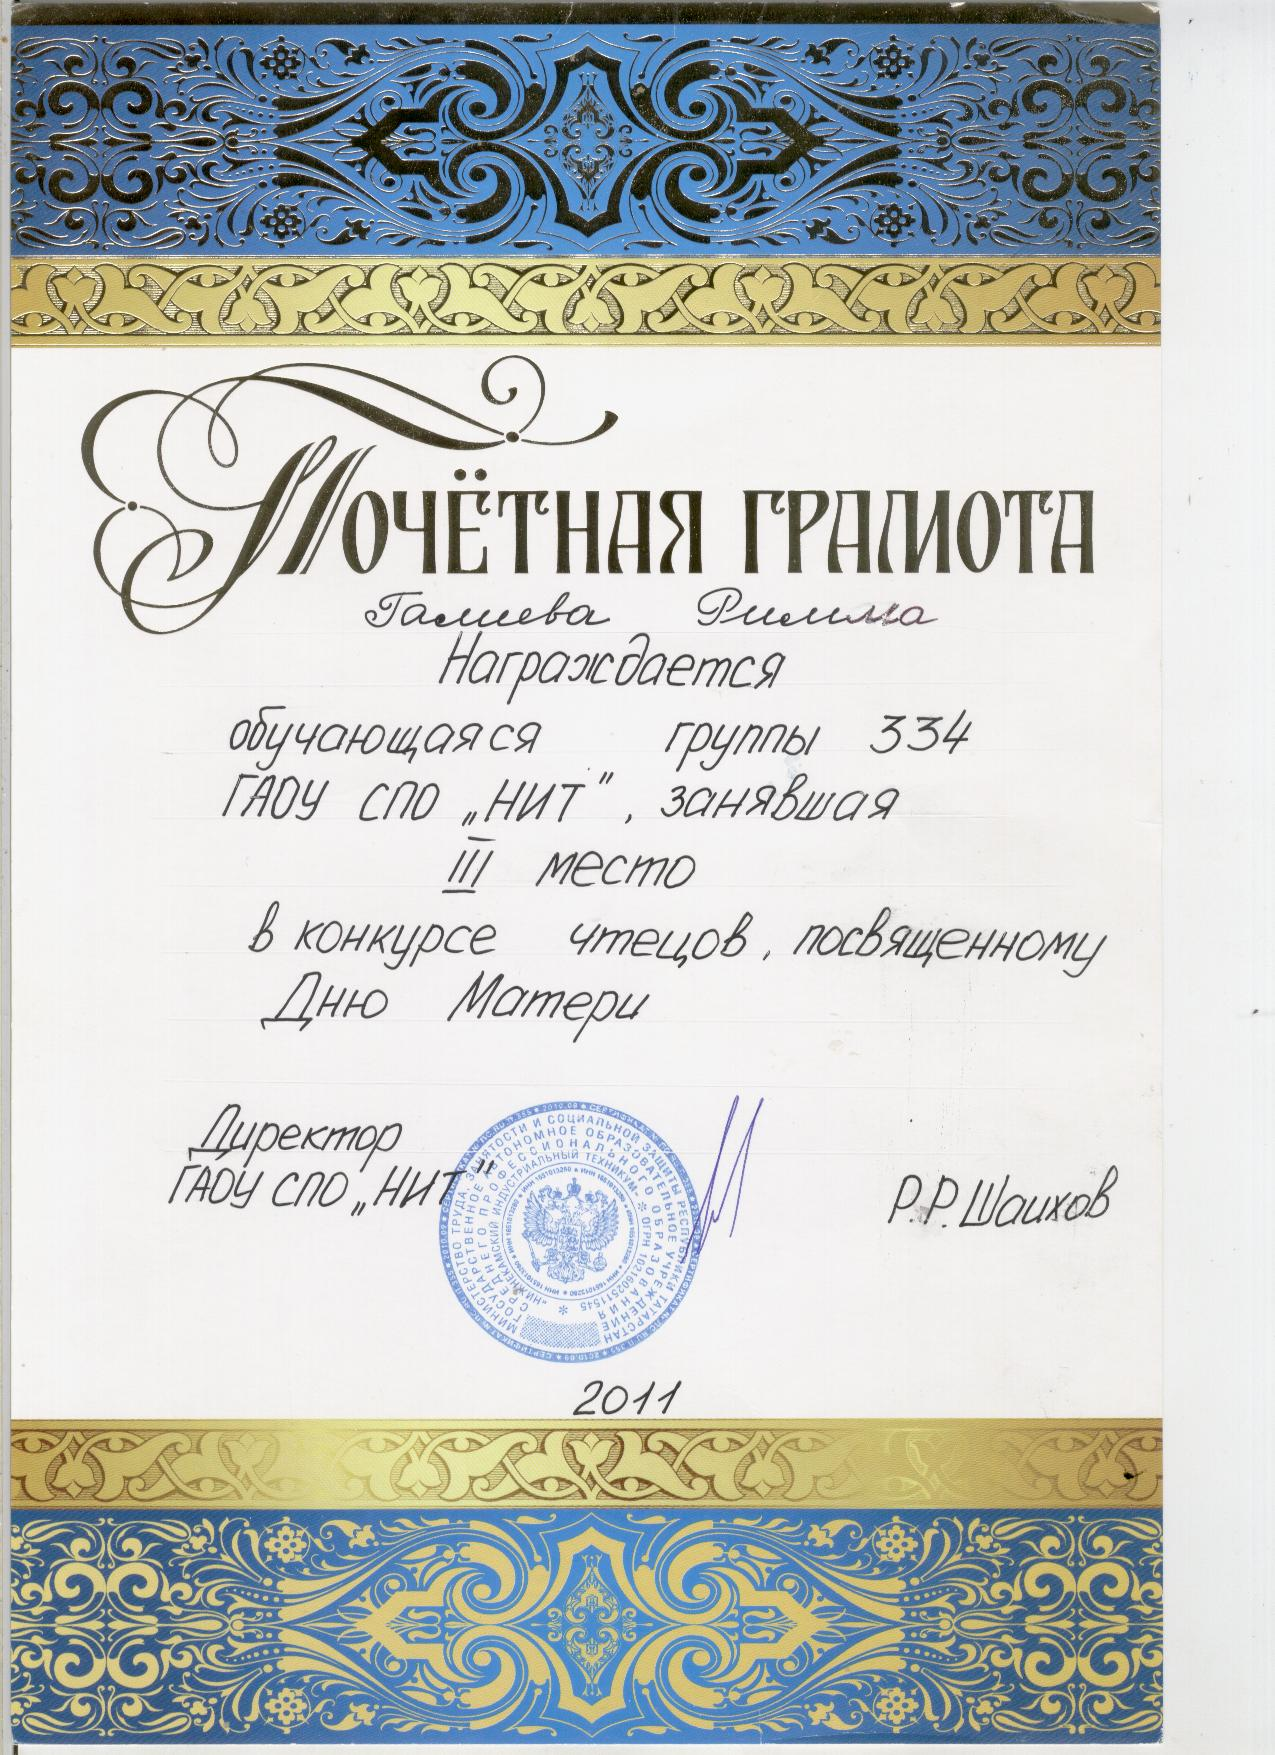 F:\Всероссйский конкурс Портфолио выпускника\РИММА\Римма 030.jpg